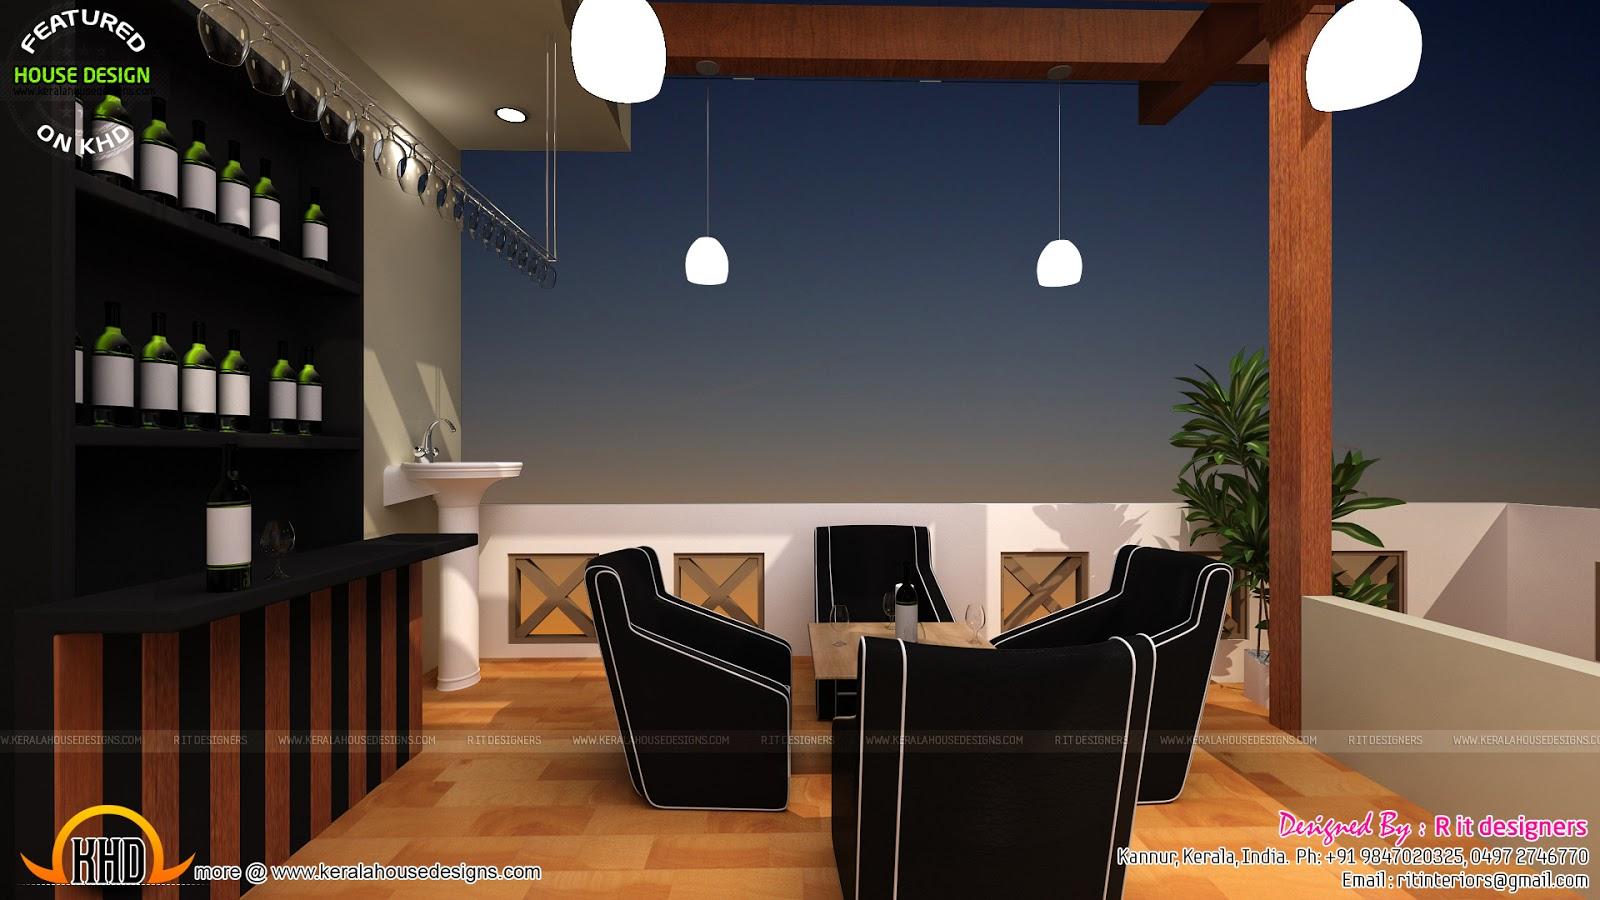 Terrace gazebo designs in India - Kerala home design and ...